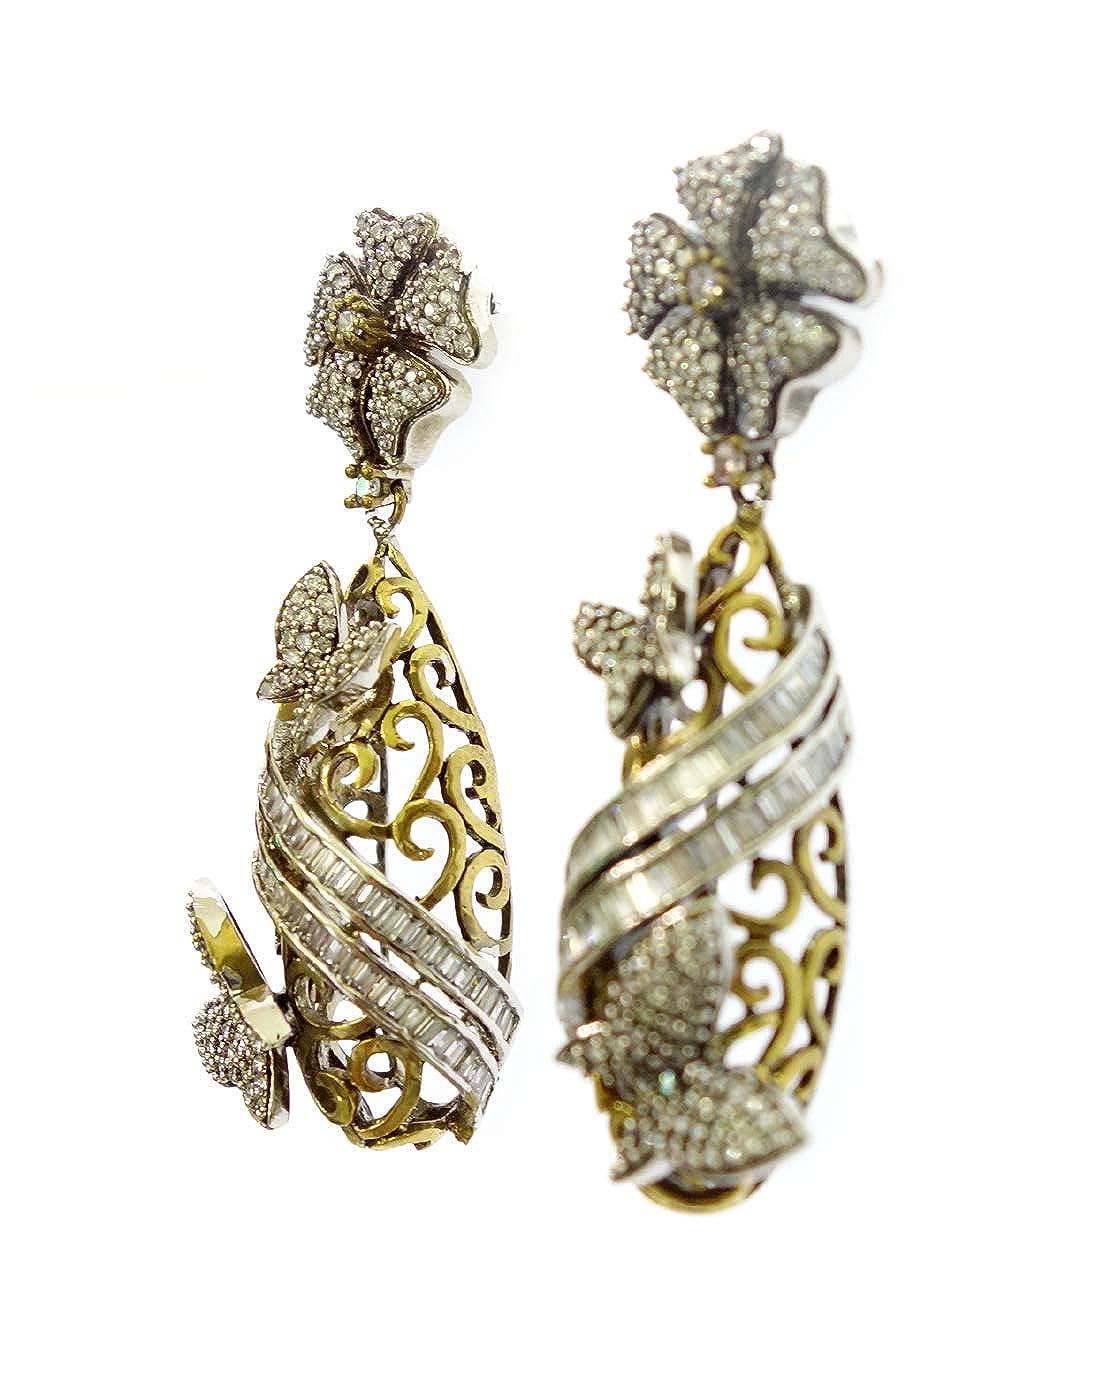 FASHION DROP DANGLE LONG EARRINGS FOR WOMEN AND GIRLS OXIDIZED 22CT GOLD PLATED ETHNIC VICTORIAN EARRINGS CUBIC ZIRCON BUTTERFLY DESIGNER FLOWER EARRINGS TIBETAN SILVER